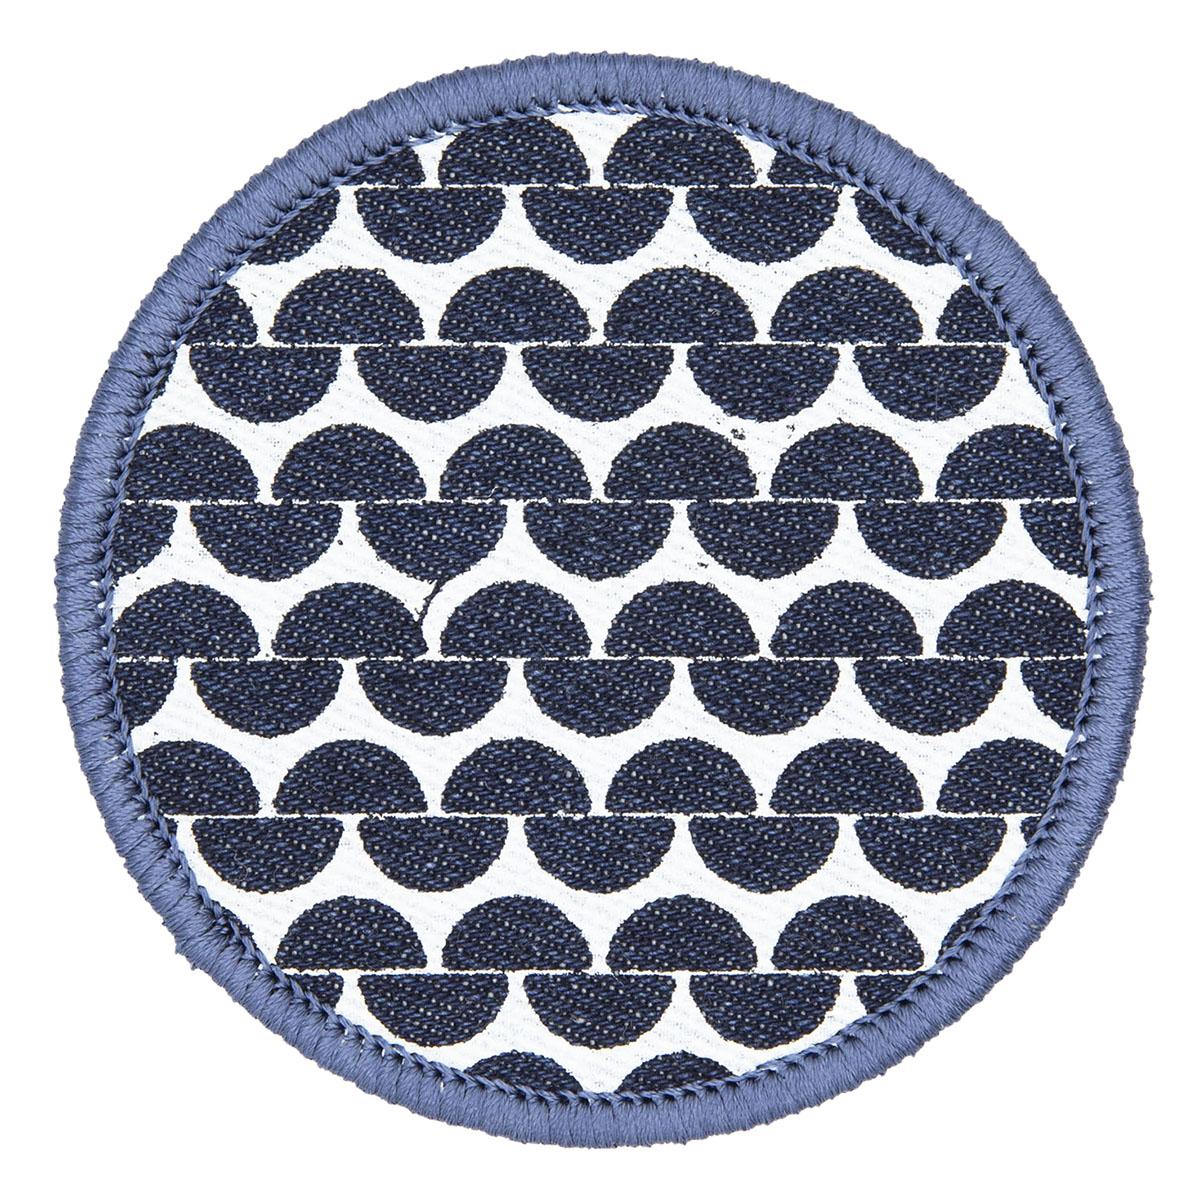 embroidered patch screen printed garter stitch design on denim